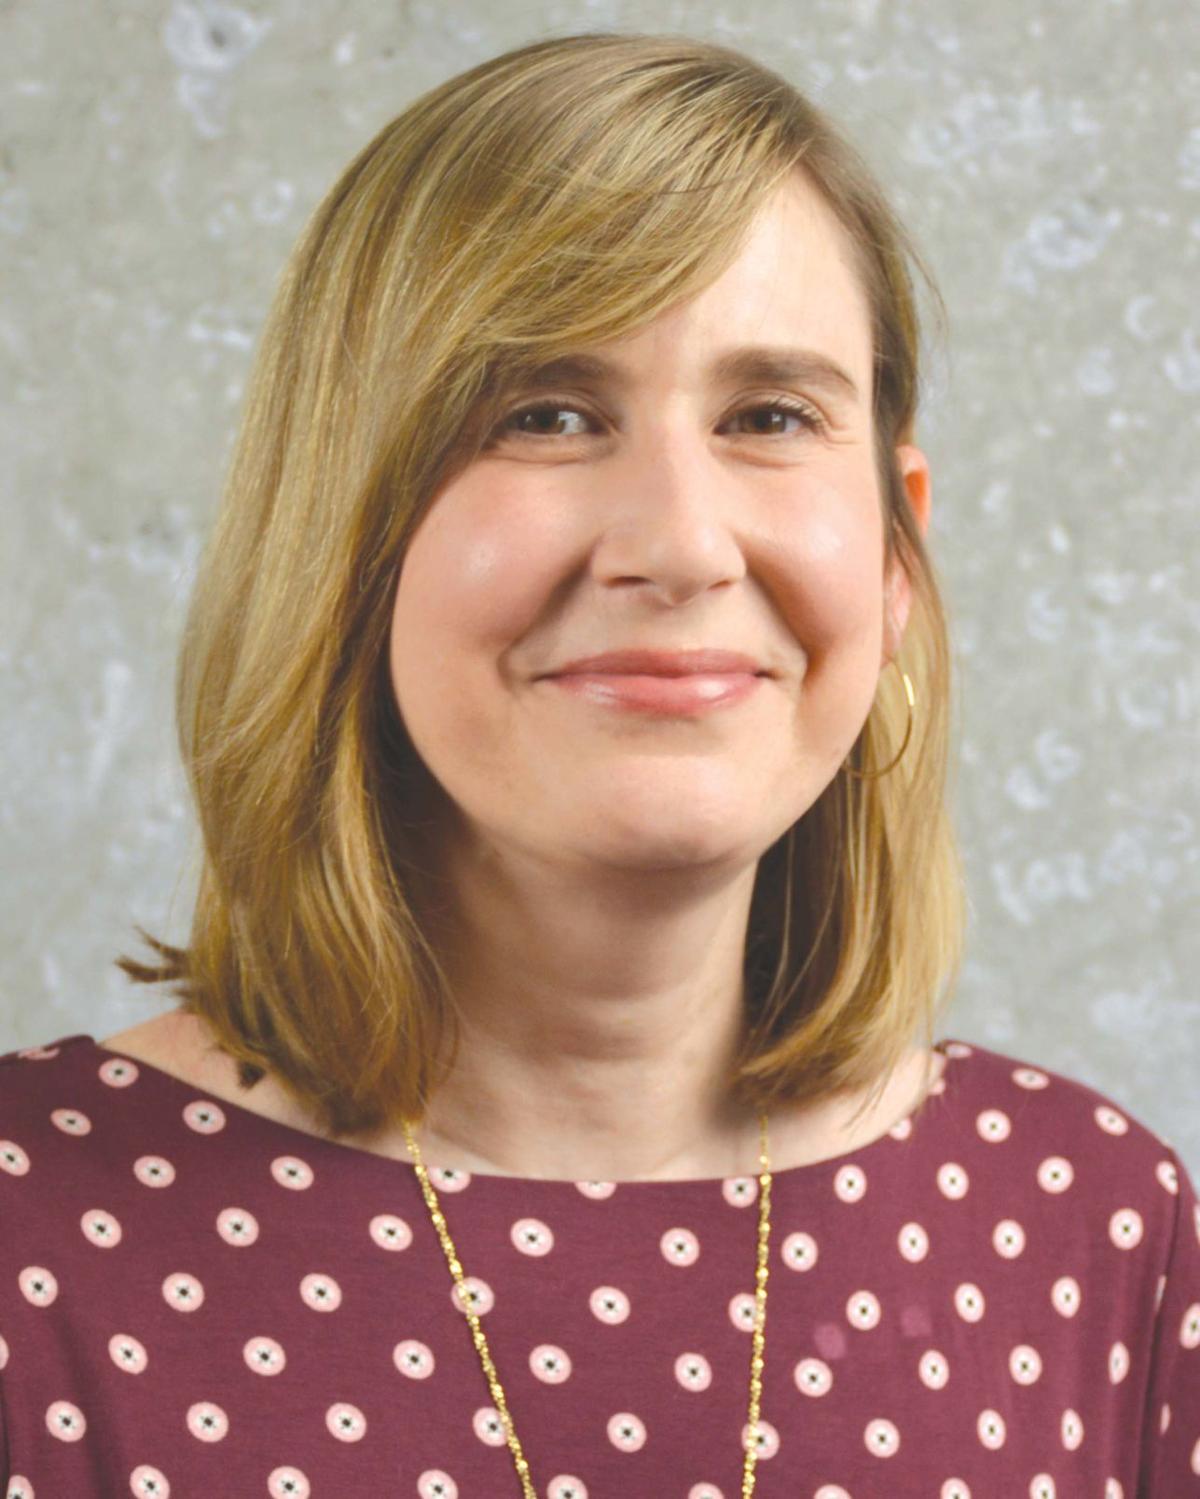 Claire Otterbein